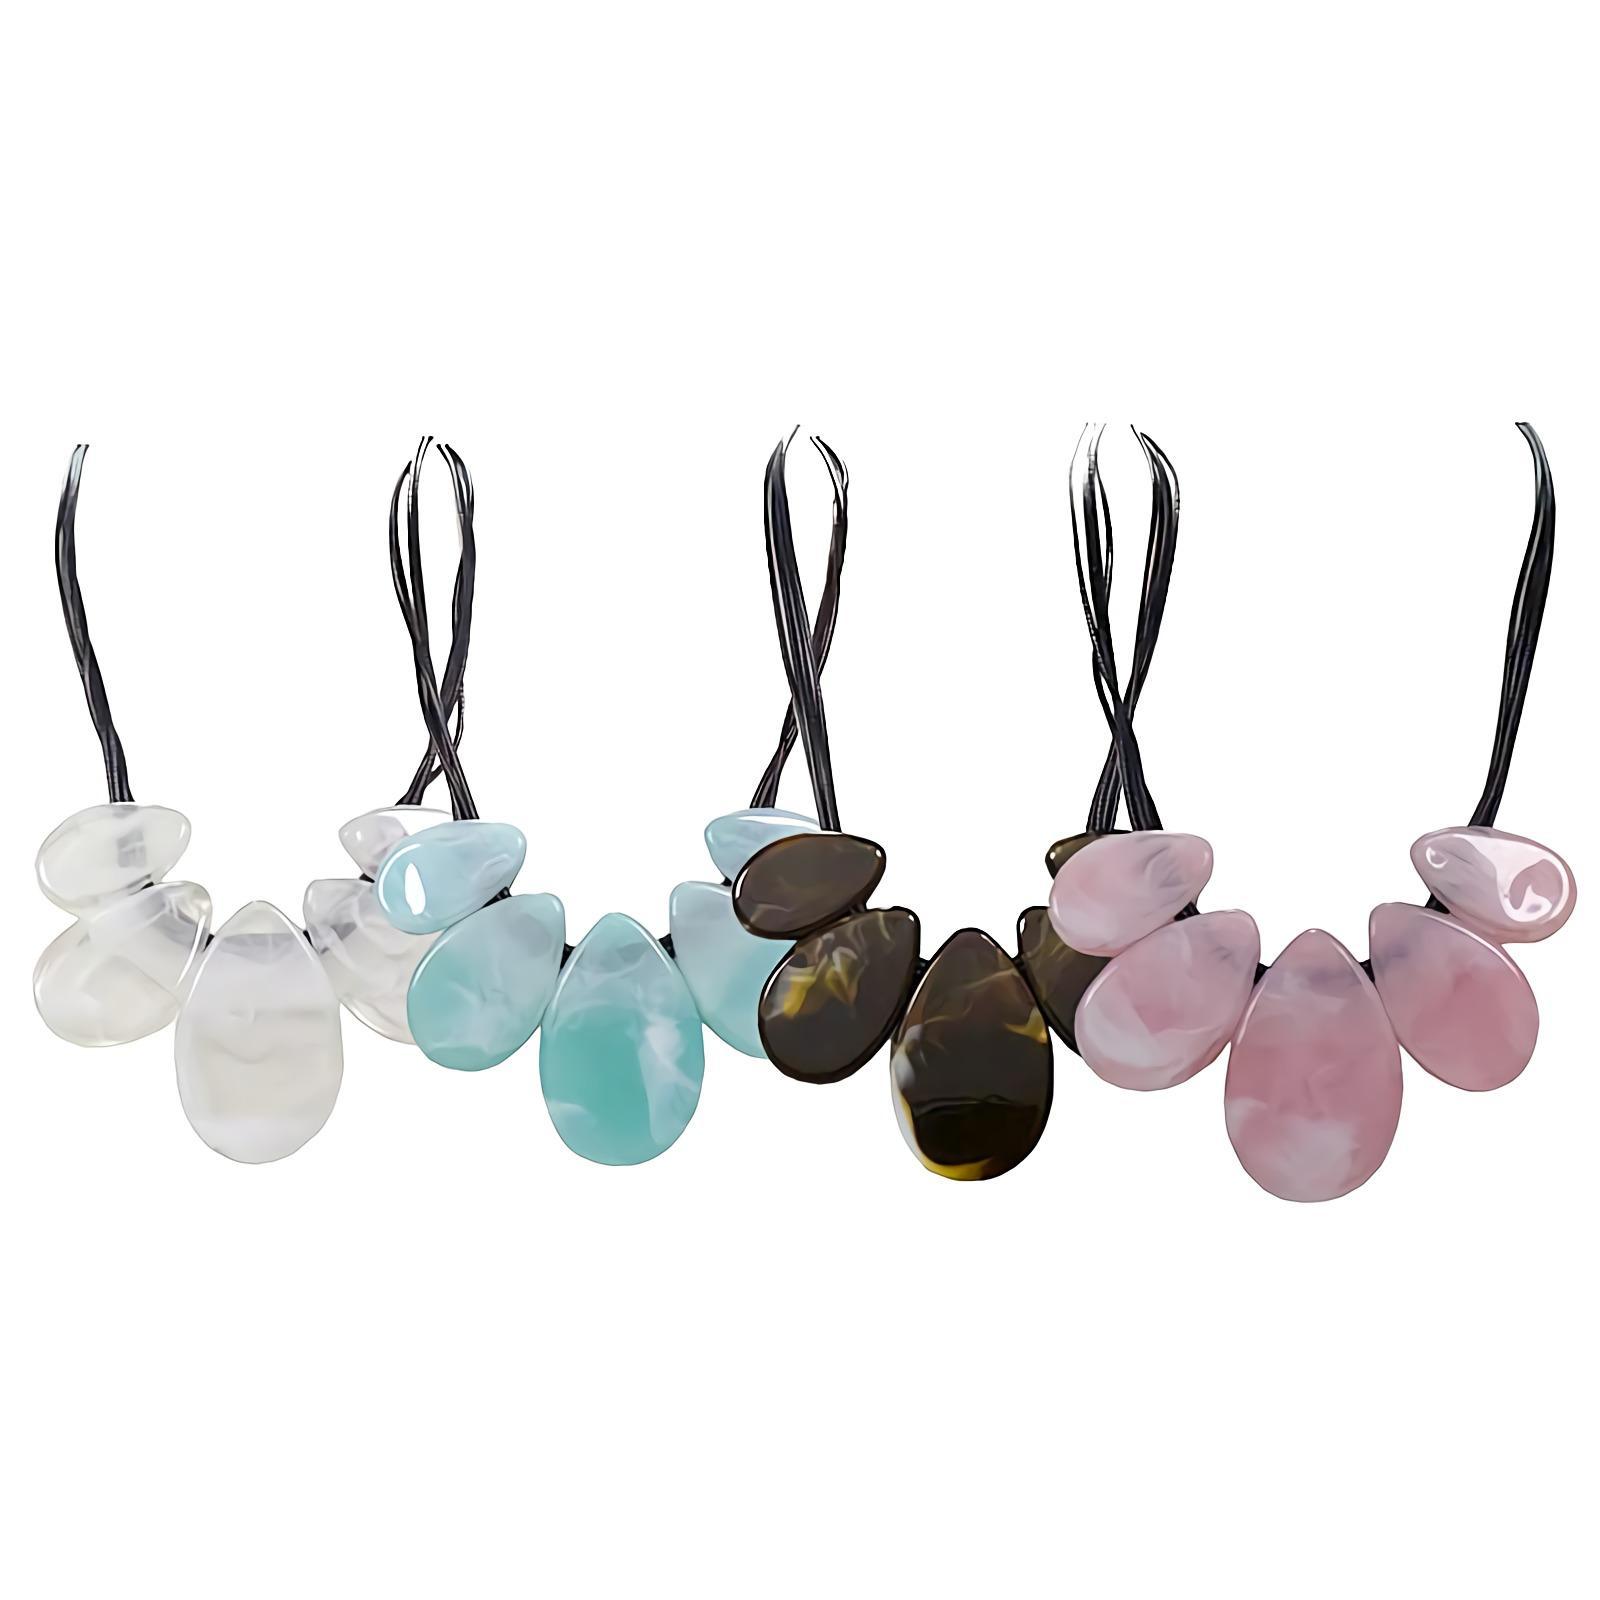 OFASHION Colorful Accessories Kalung Wanita Panjang 63 CM Necklace CA -180802-K012